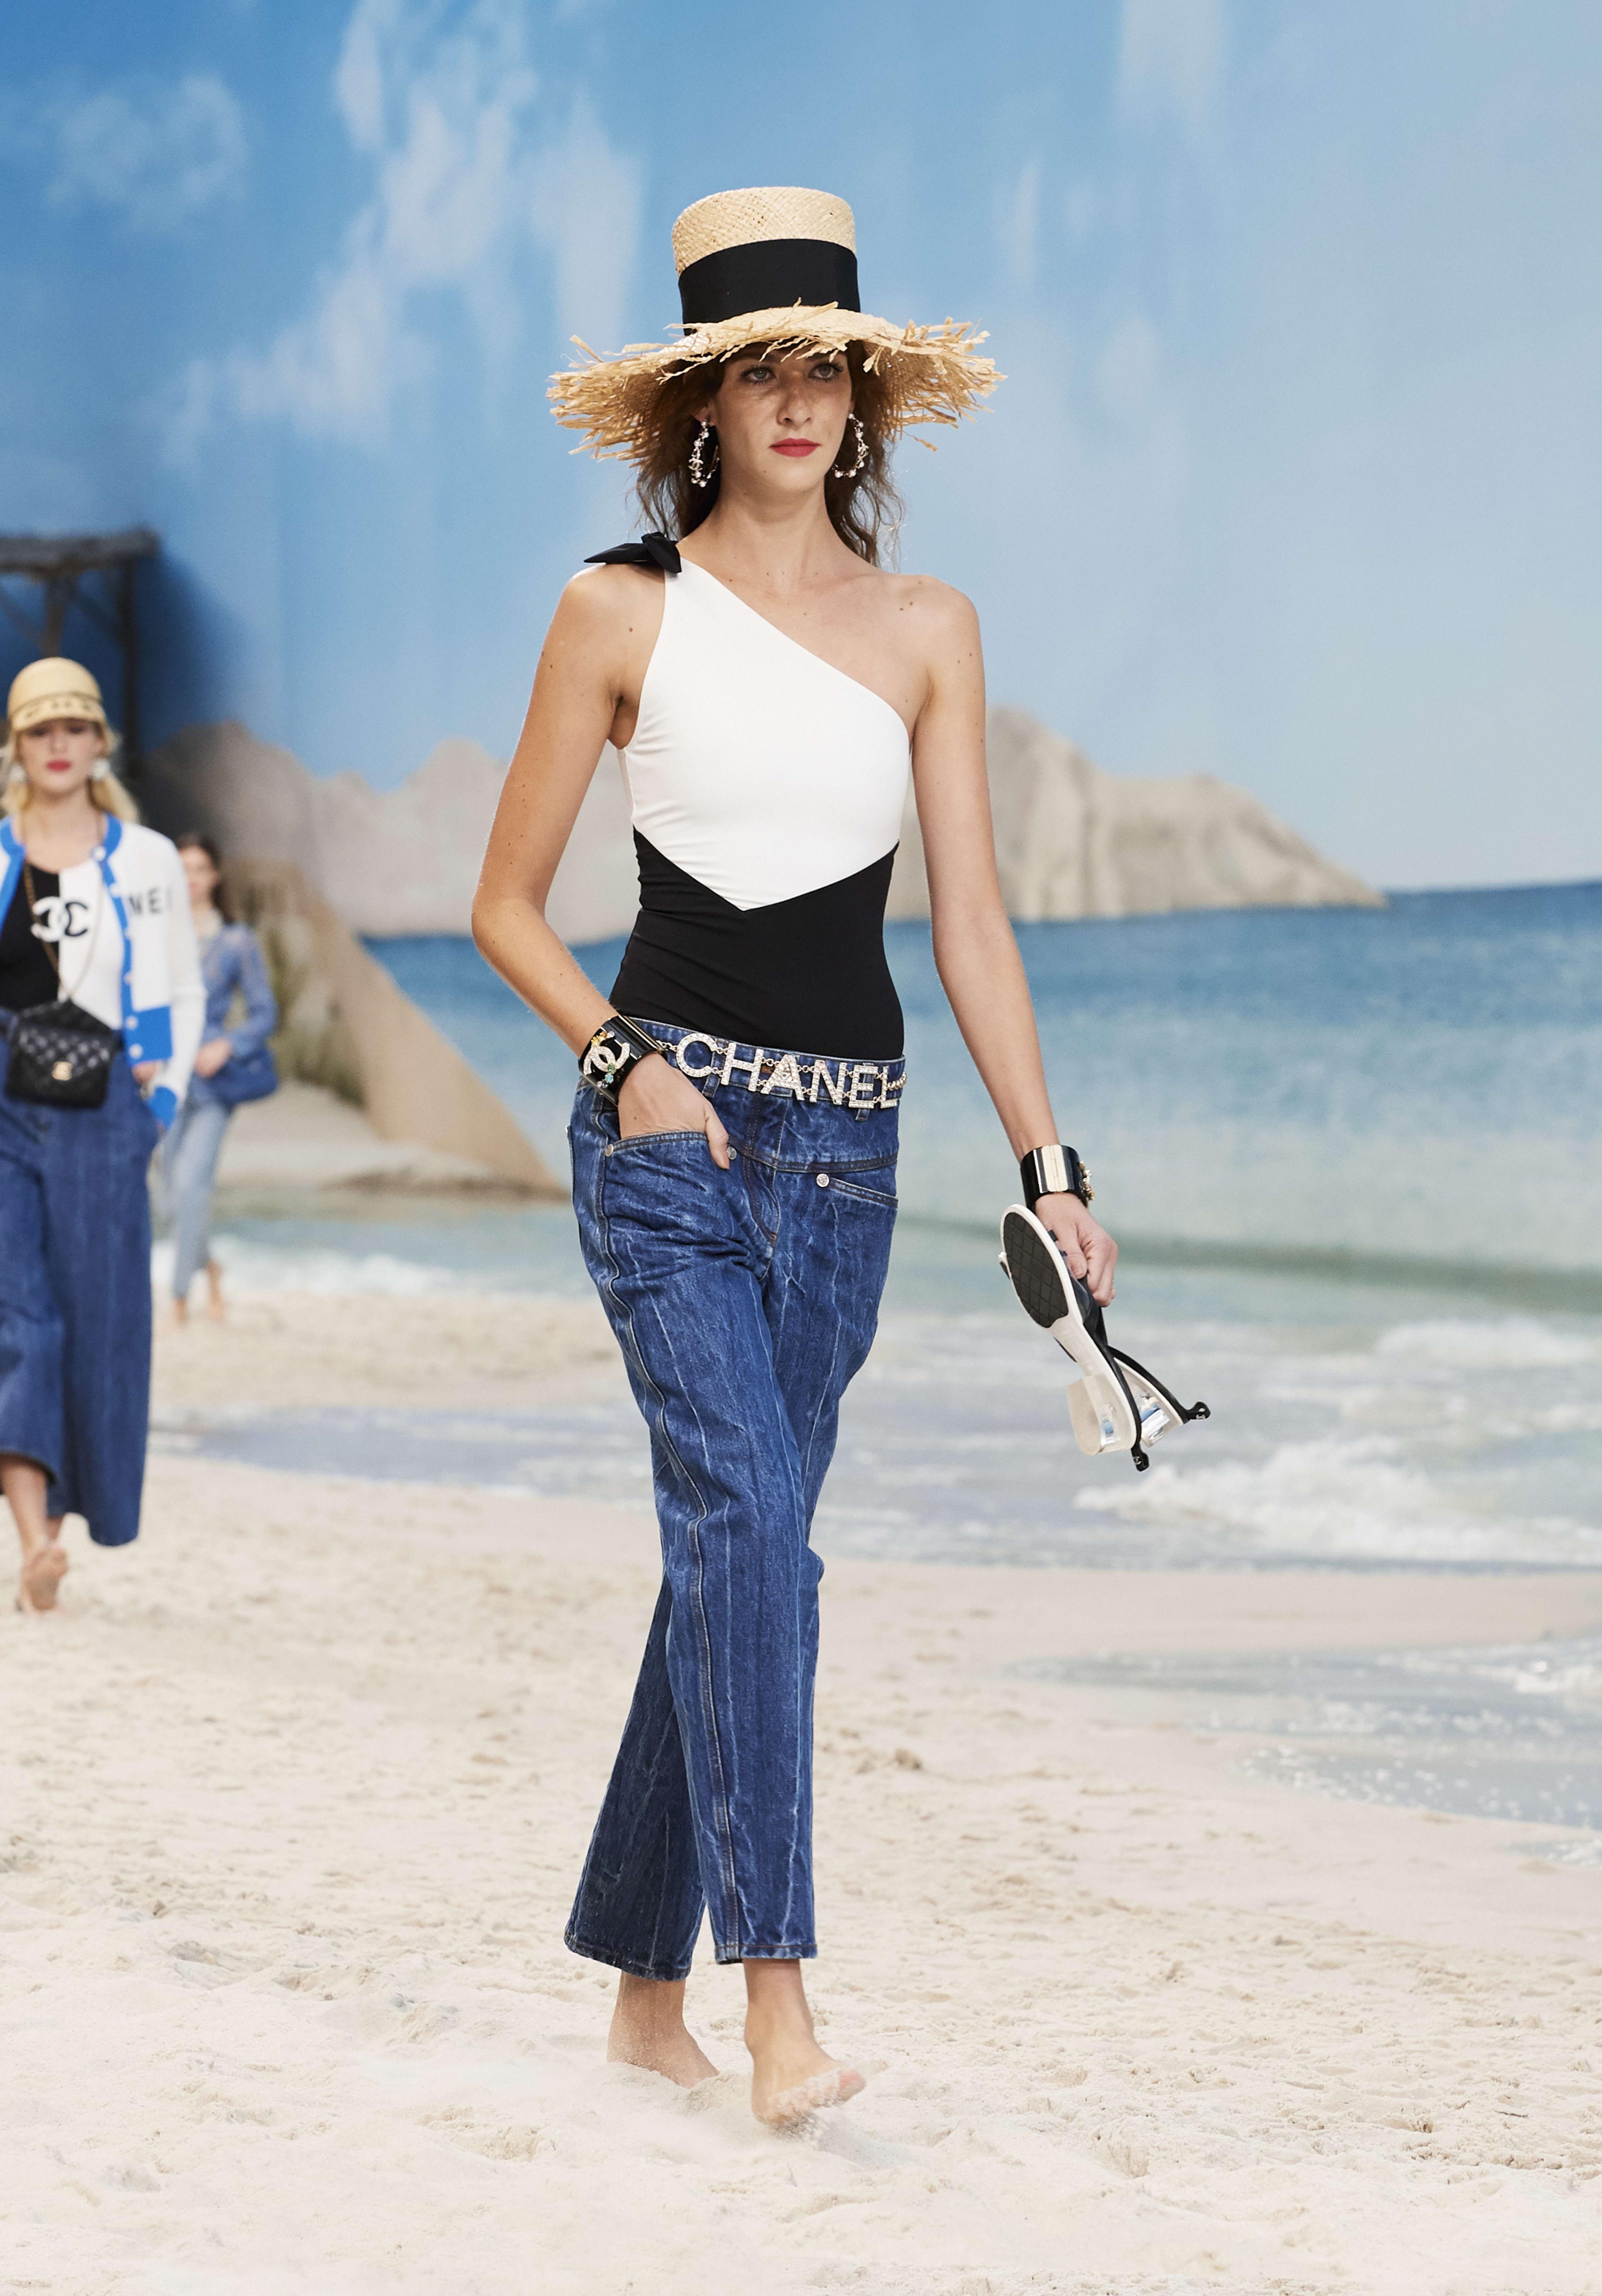 Pants Shorts Fashion Chanel